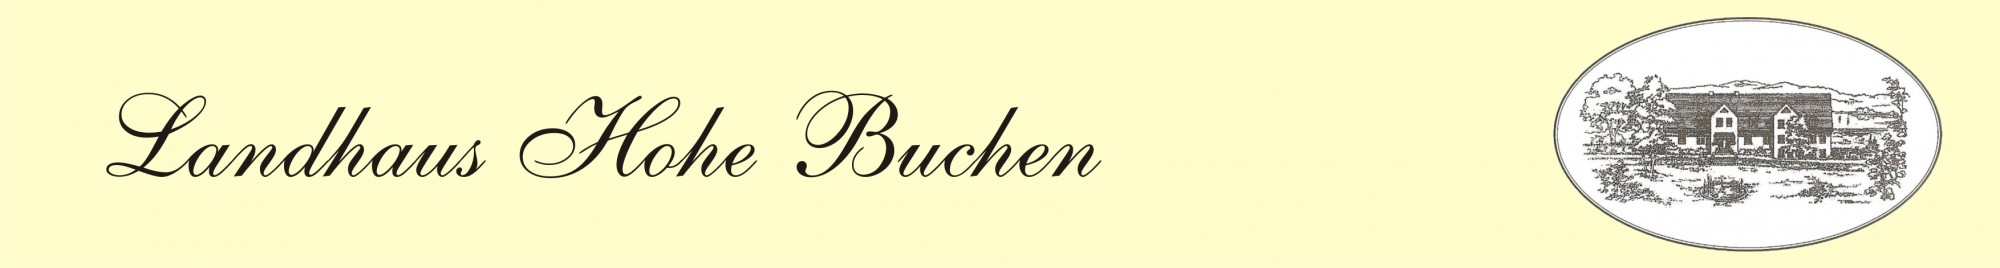 Landhaus Hohe Buchen